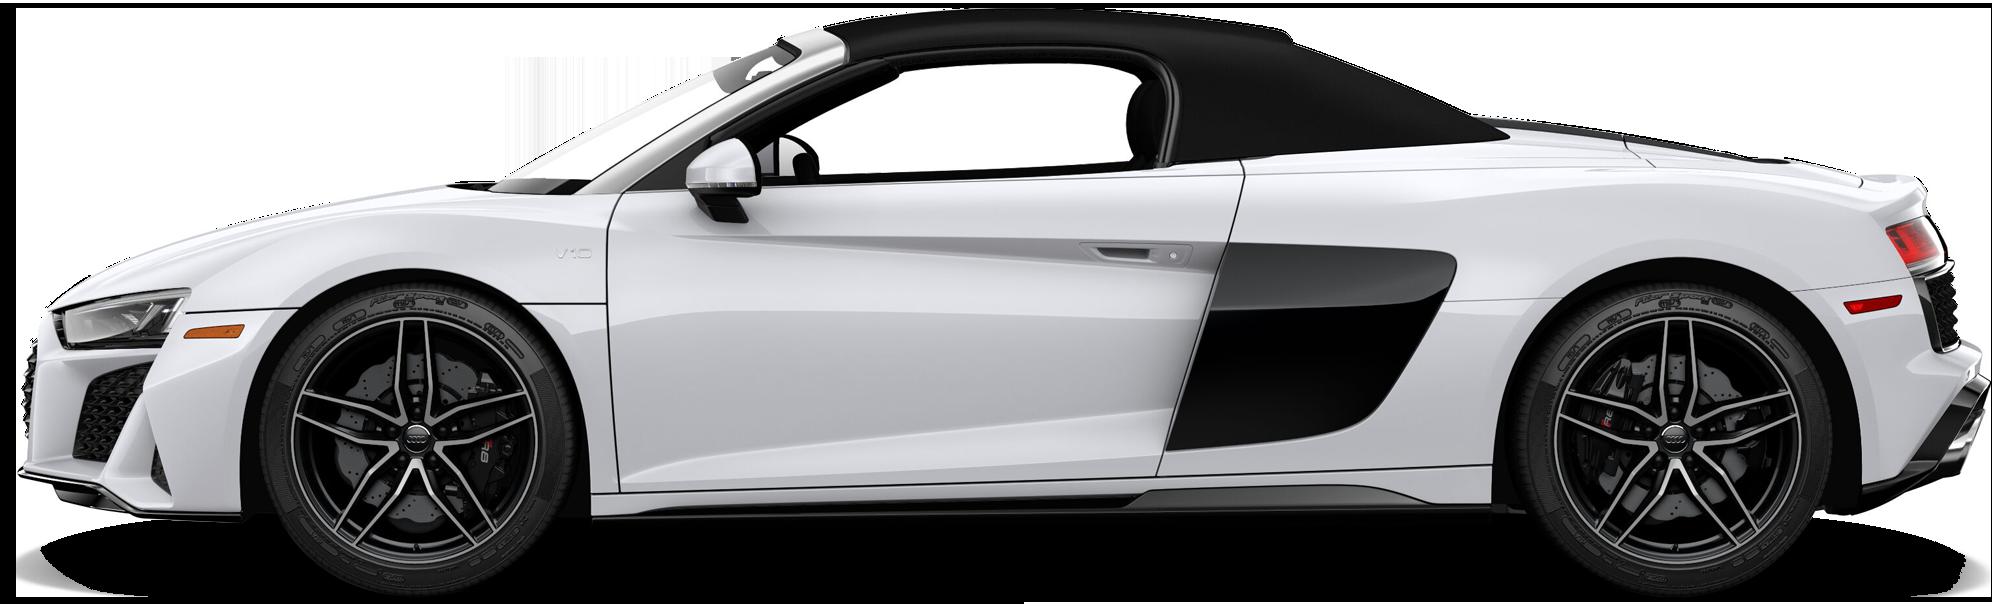 2020 Audi R8 Spyder 5.2 V10